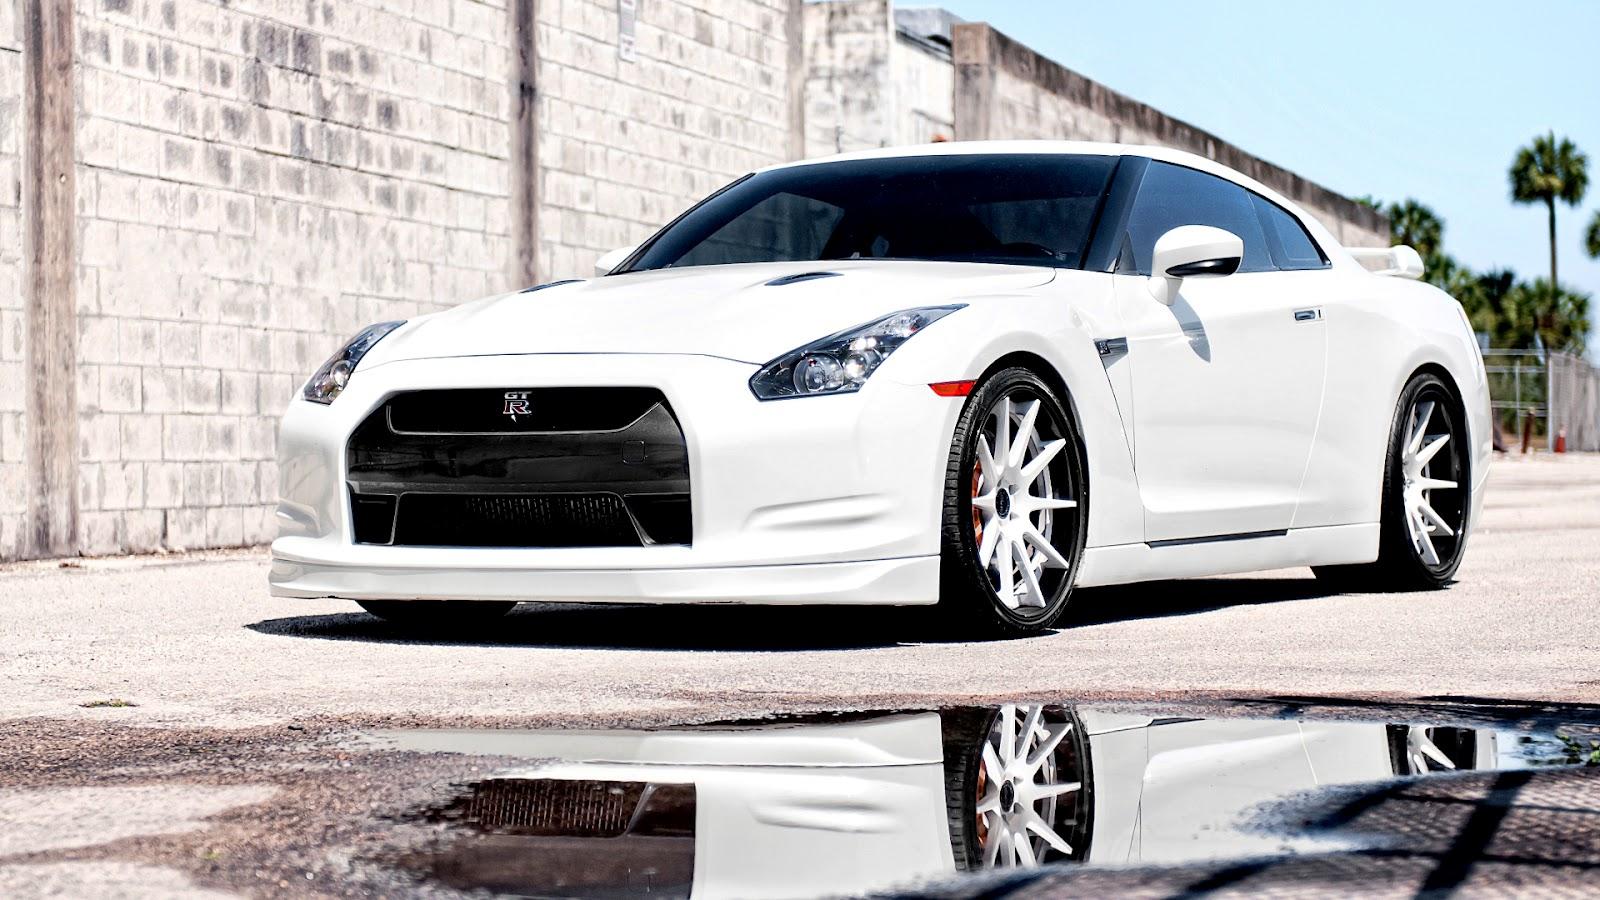 Free Cars HD: Nissan GTR HD Wallpapers